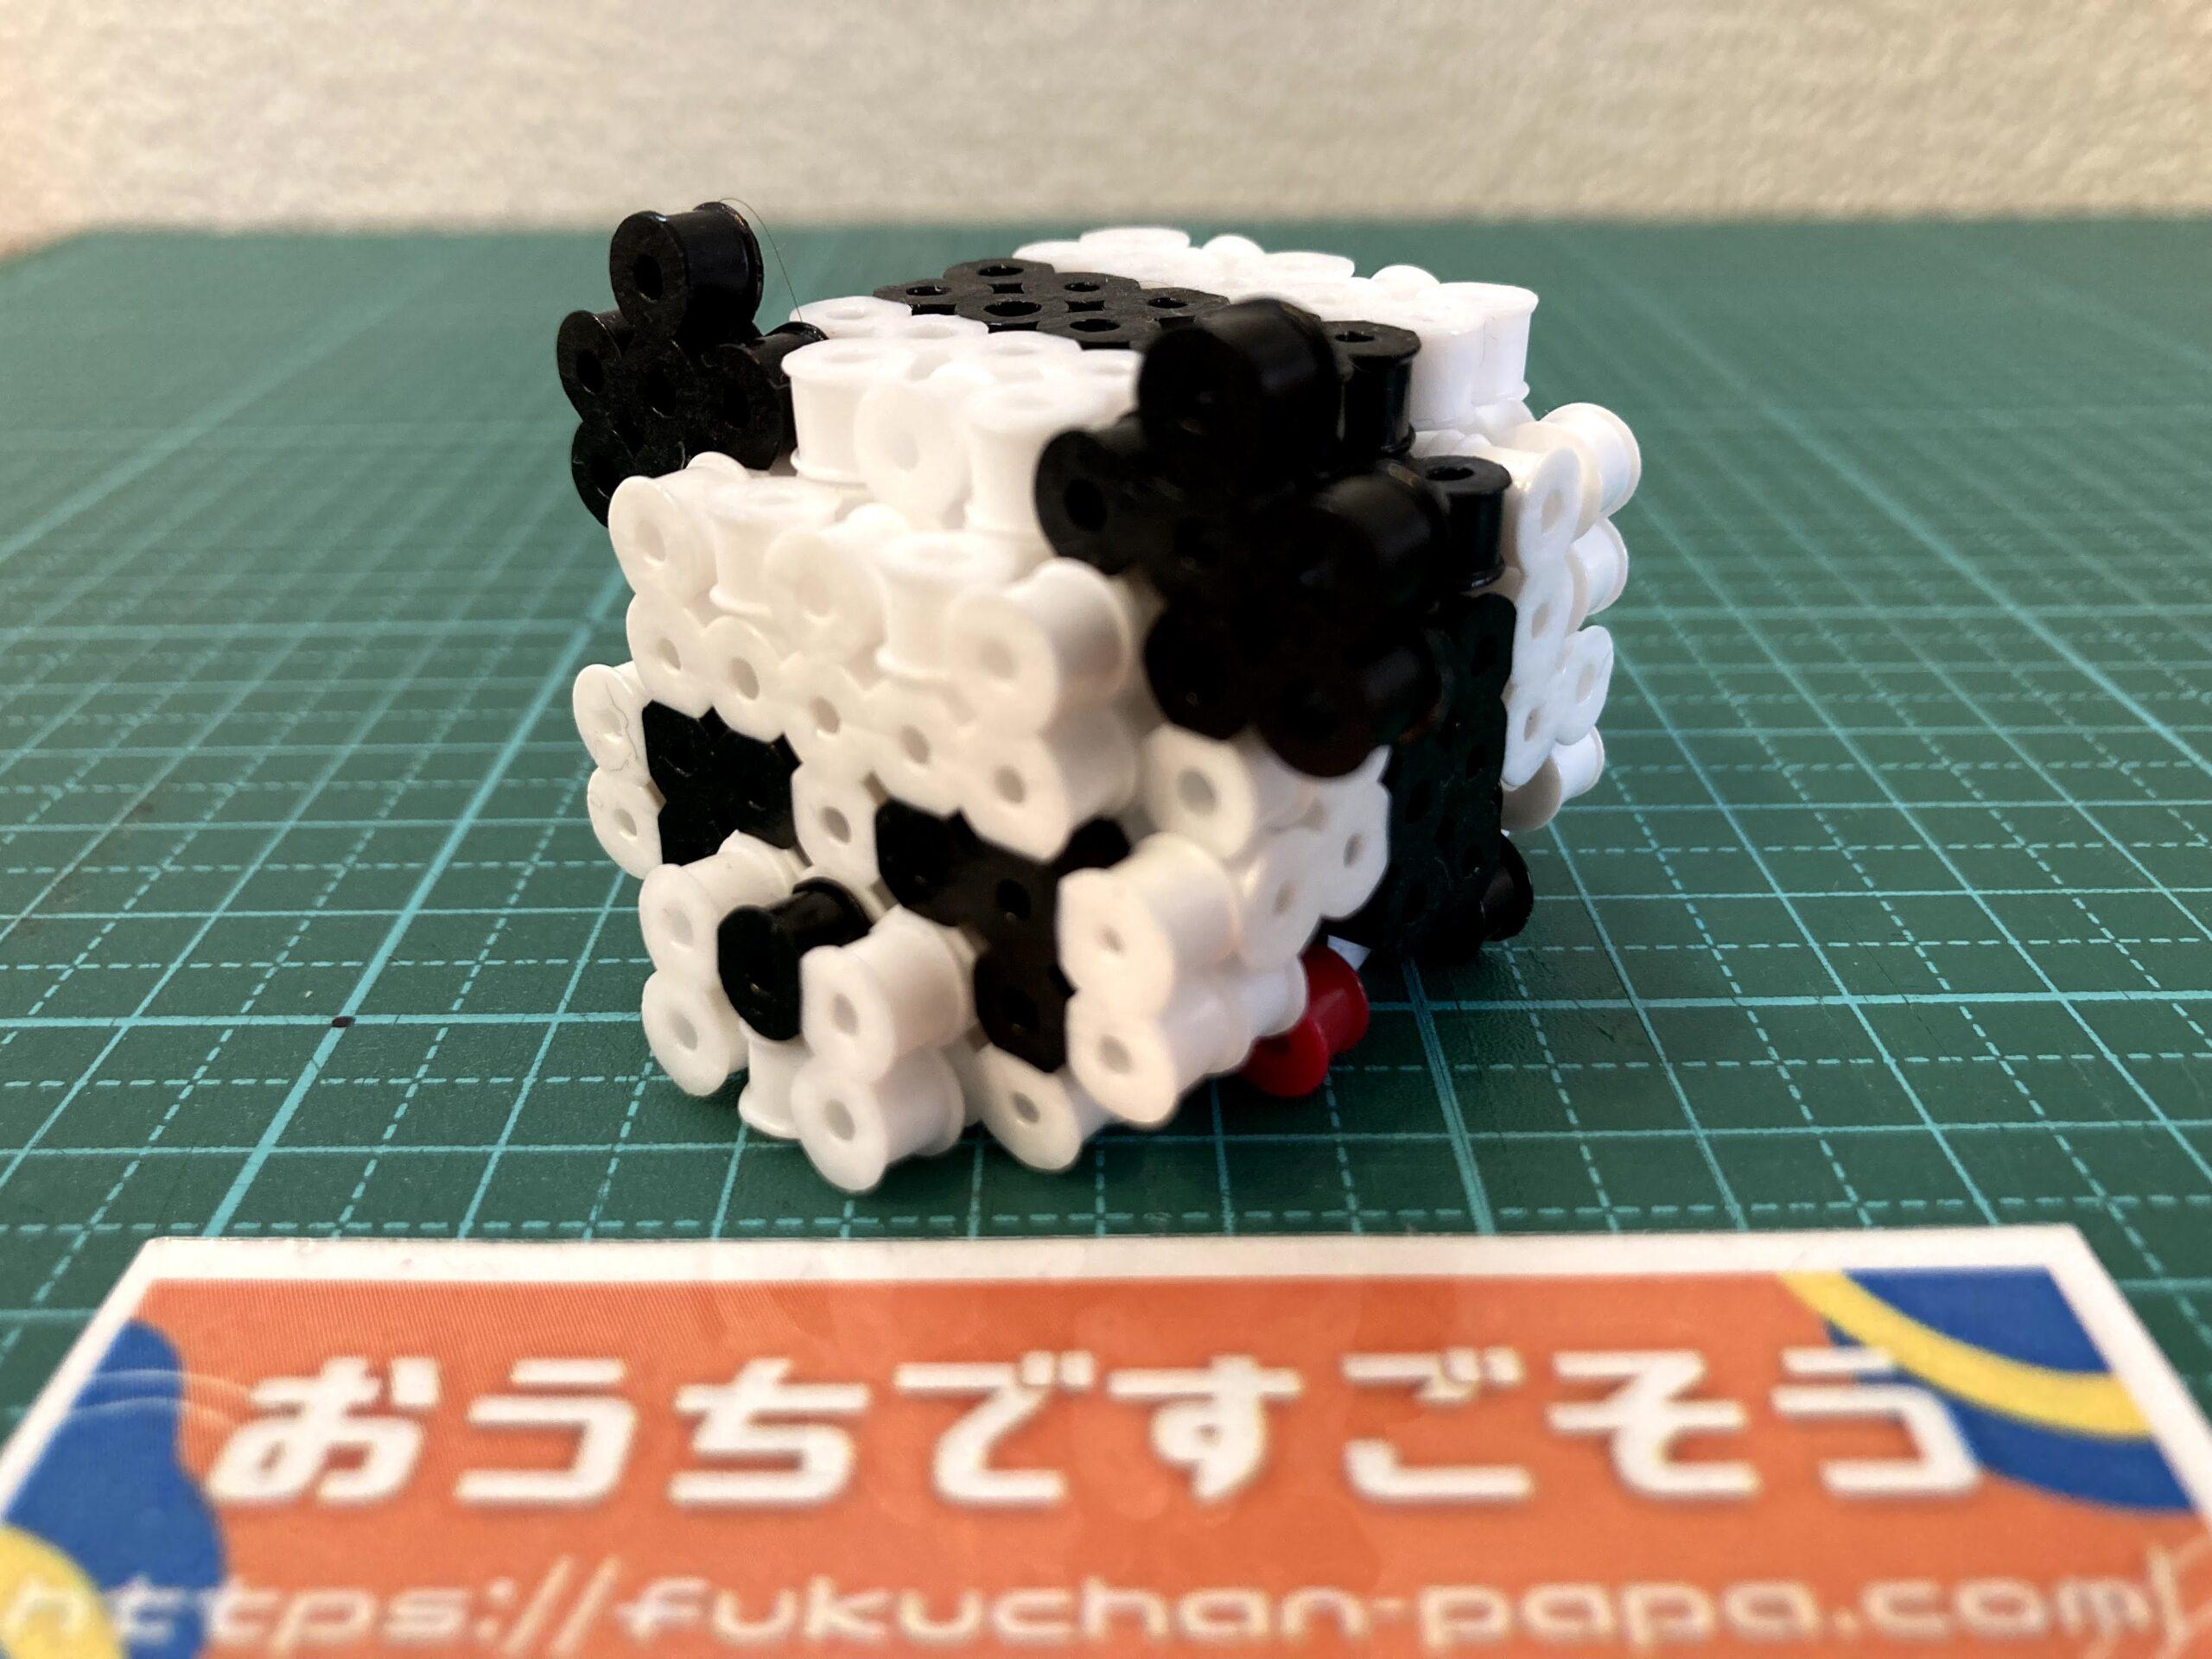 jyujyutukaisen panda 呪術開戦 パンダ